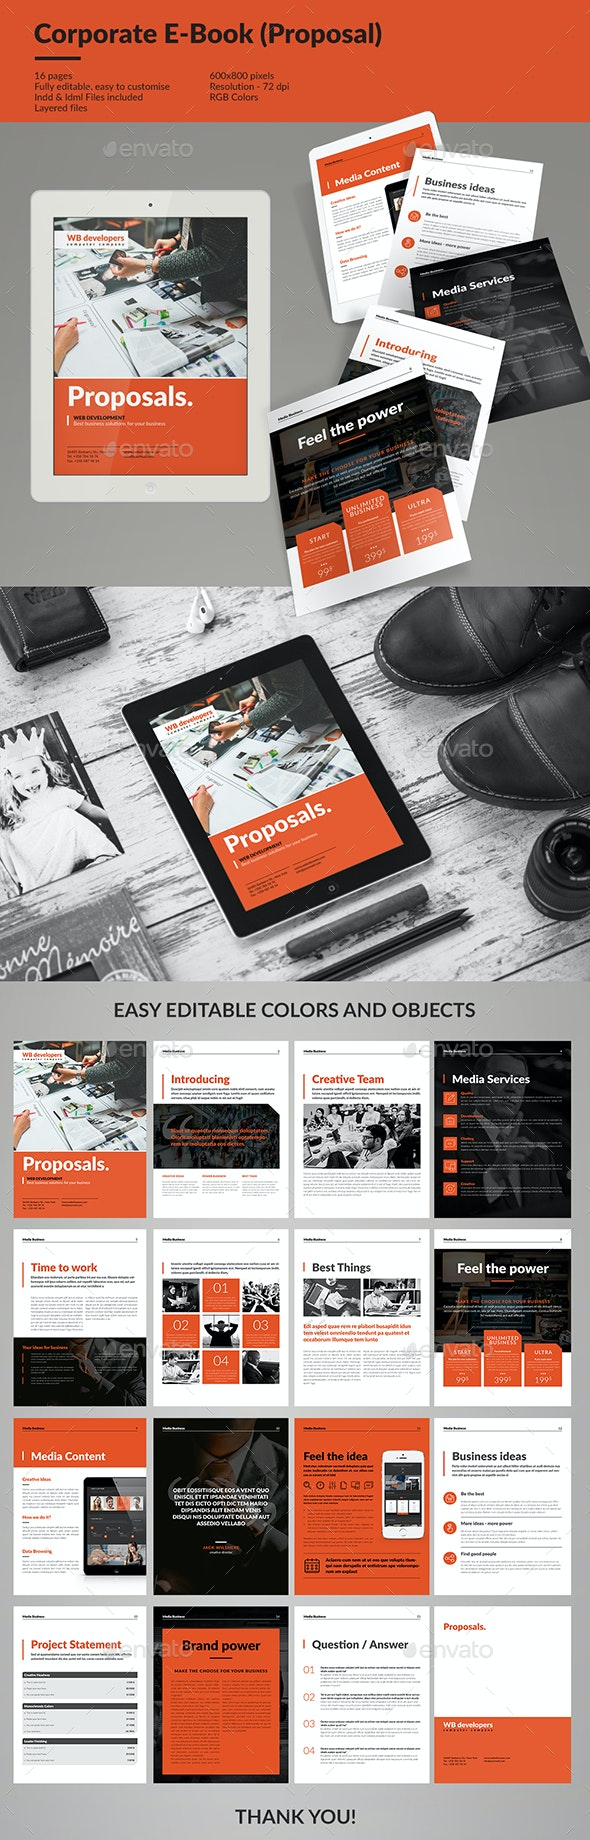 Corporate E-book Template Vol.6 - Digital Books ePublishing